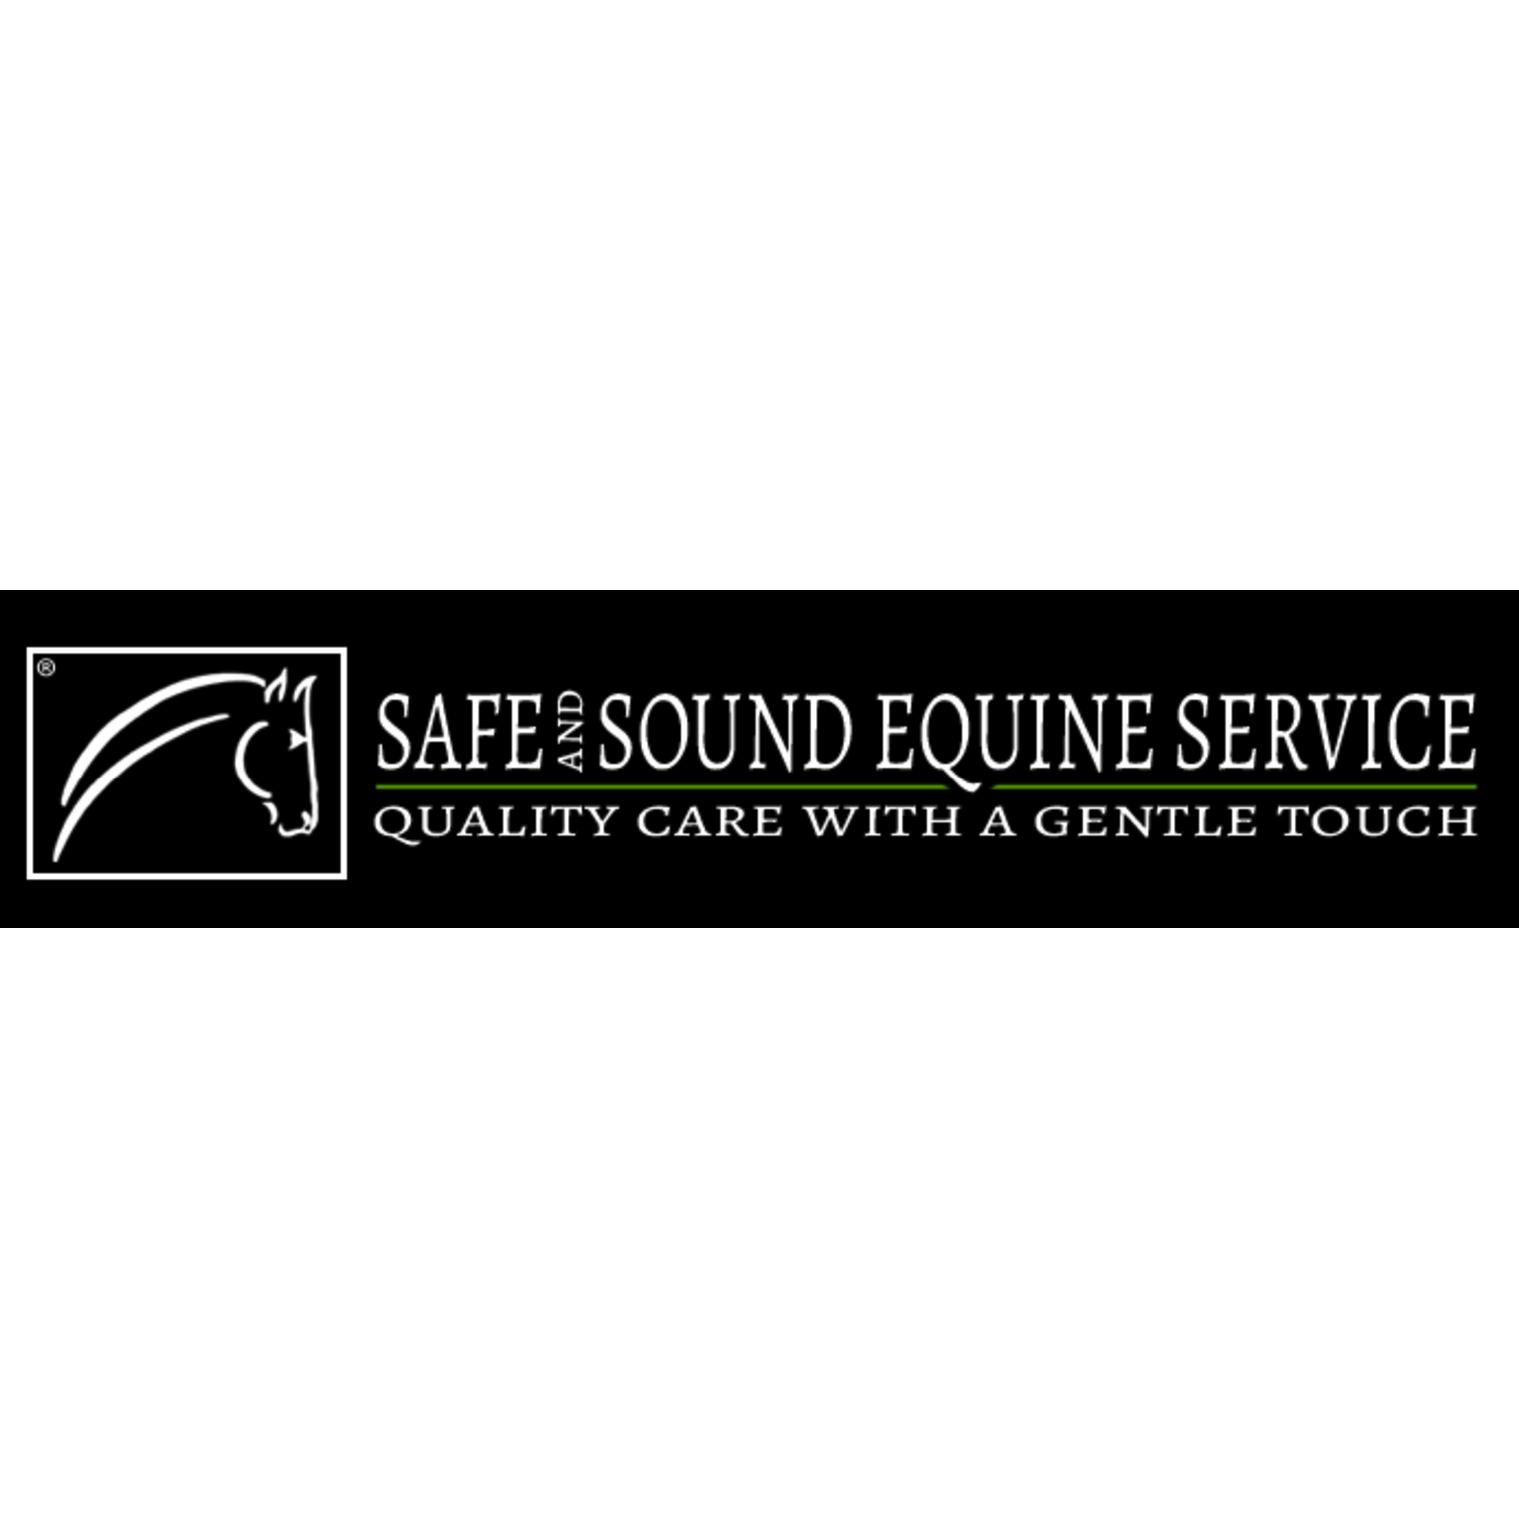 Safe and Sound Equine Service